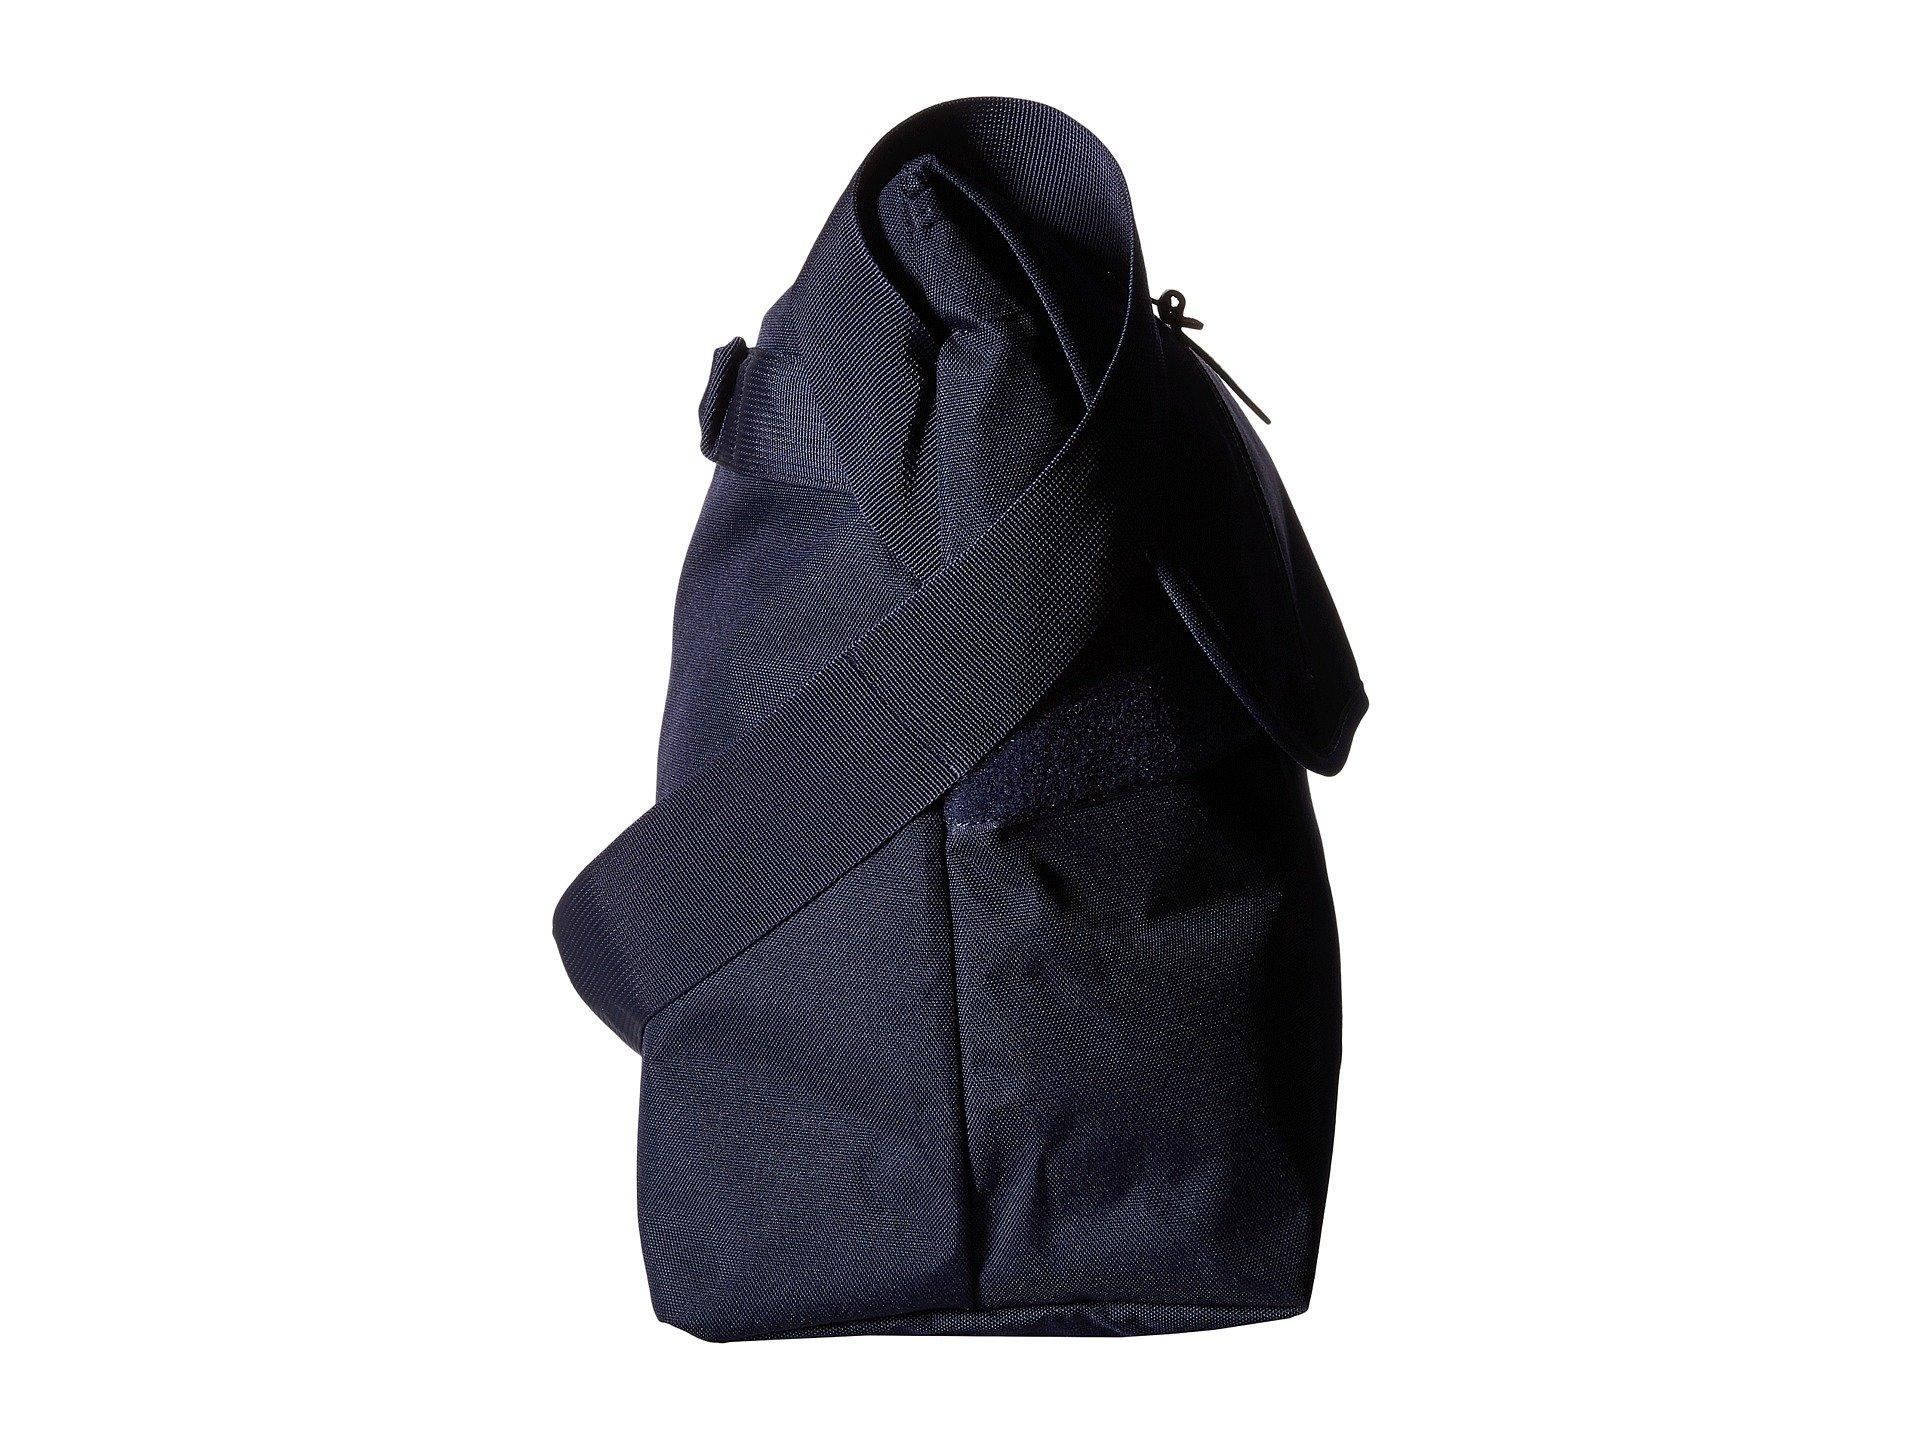 Lyst - Herschel Supply Co. Odell (brushstroke Camo) Messenger Bags ... 3415d94e977ba